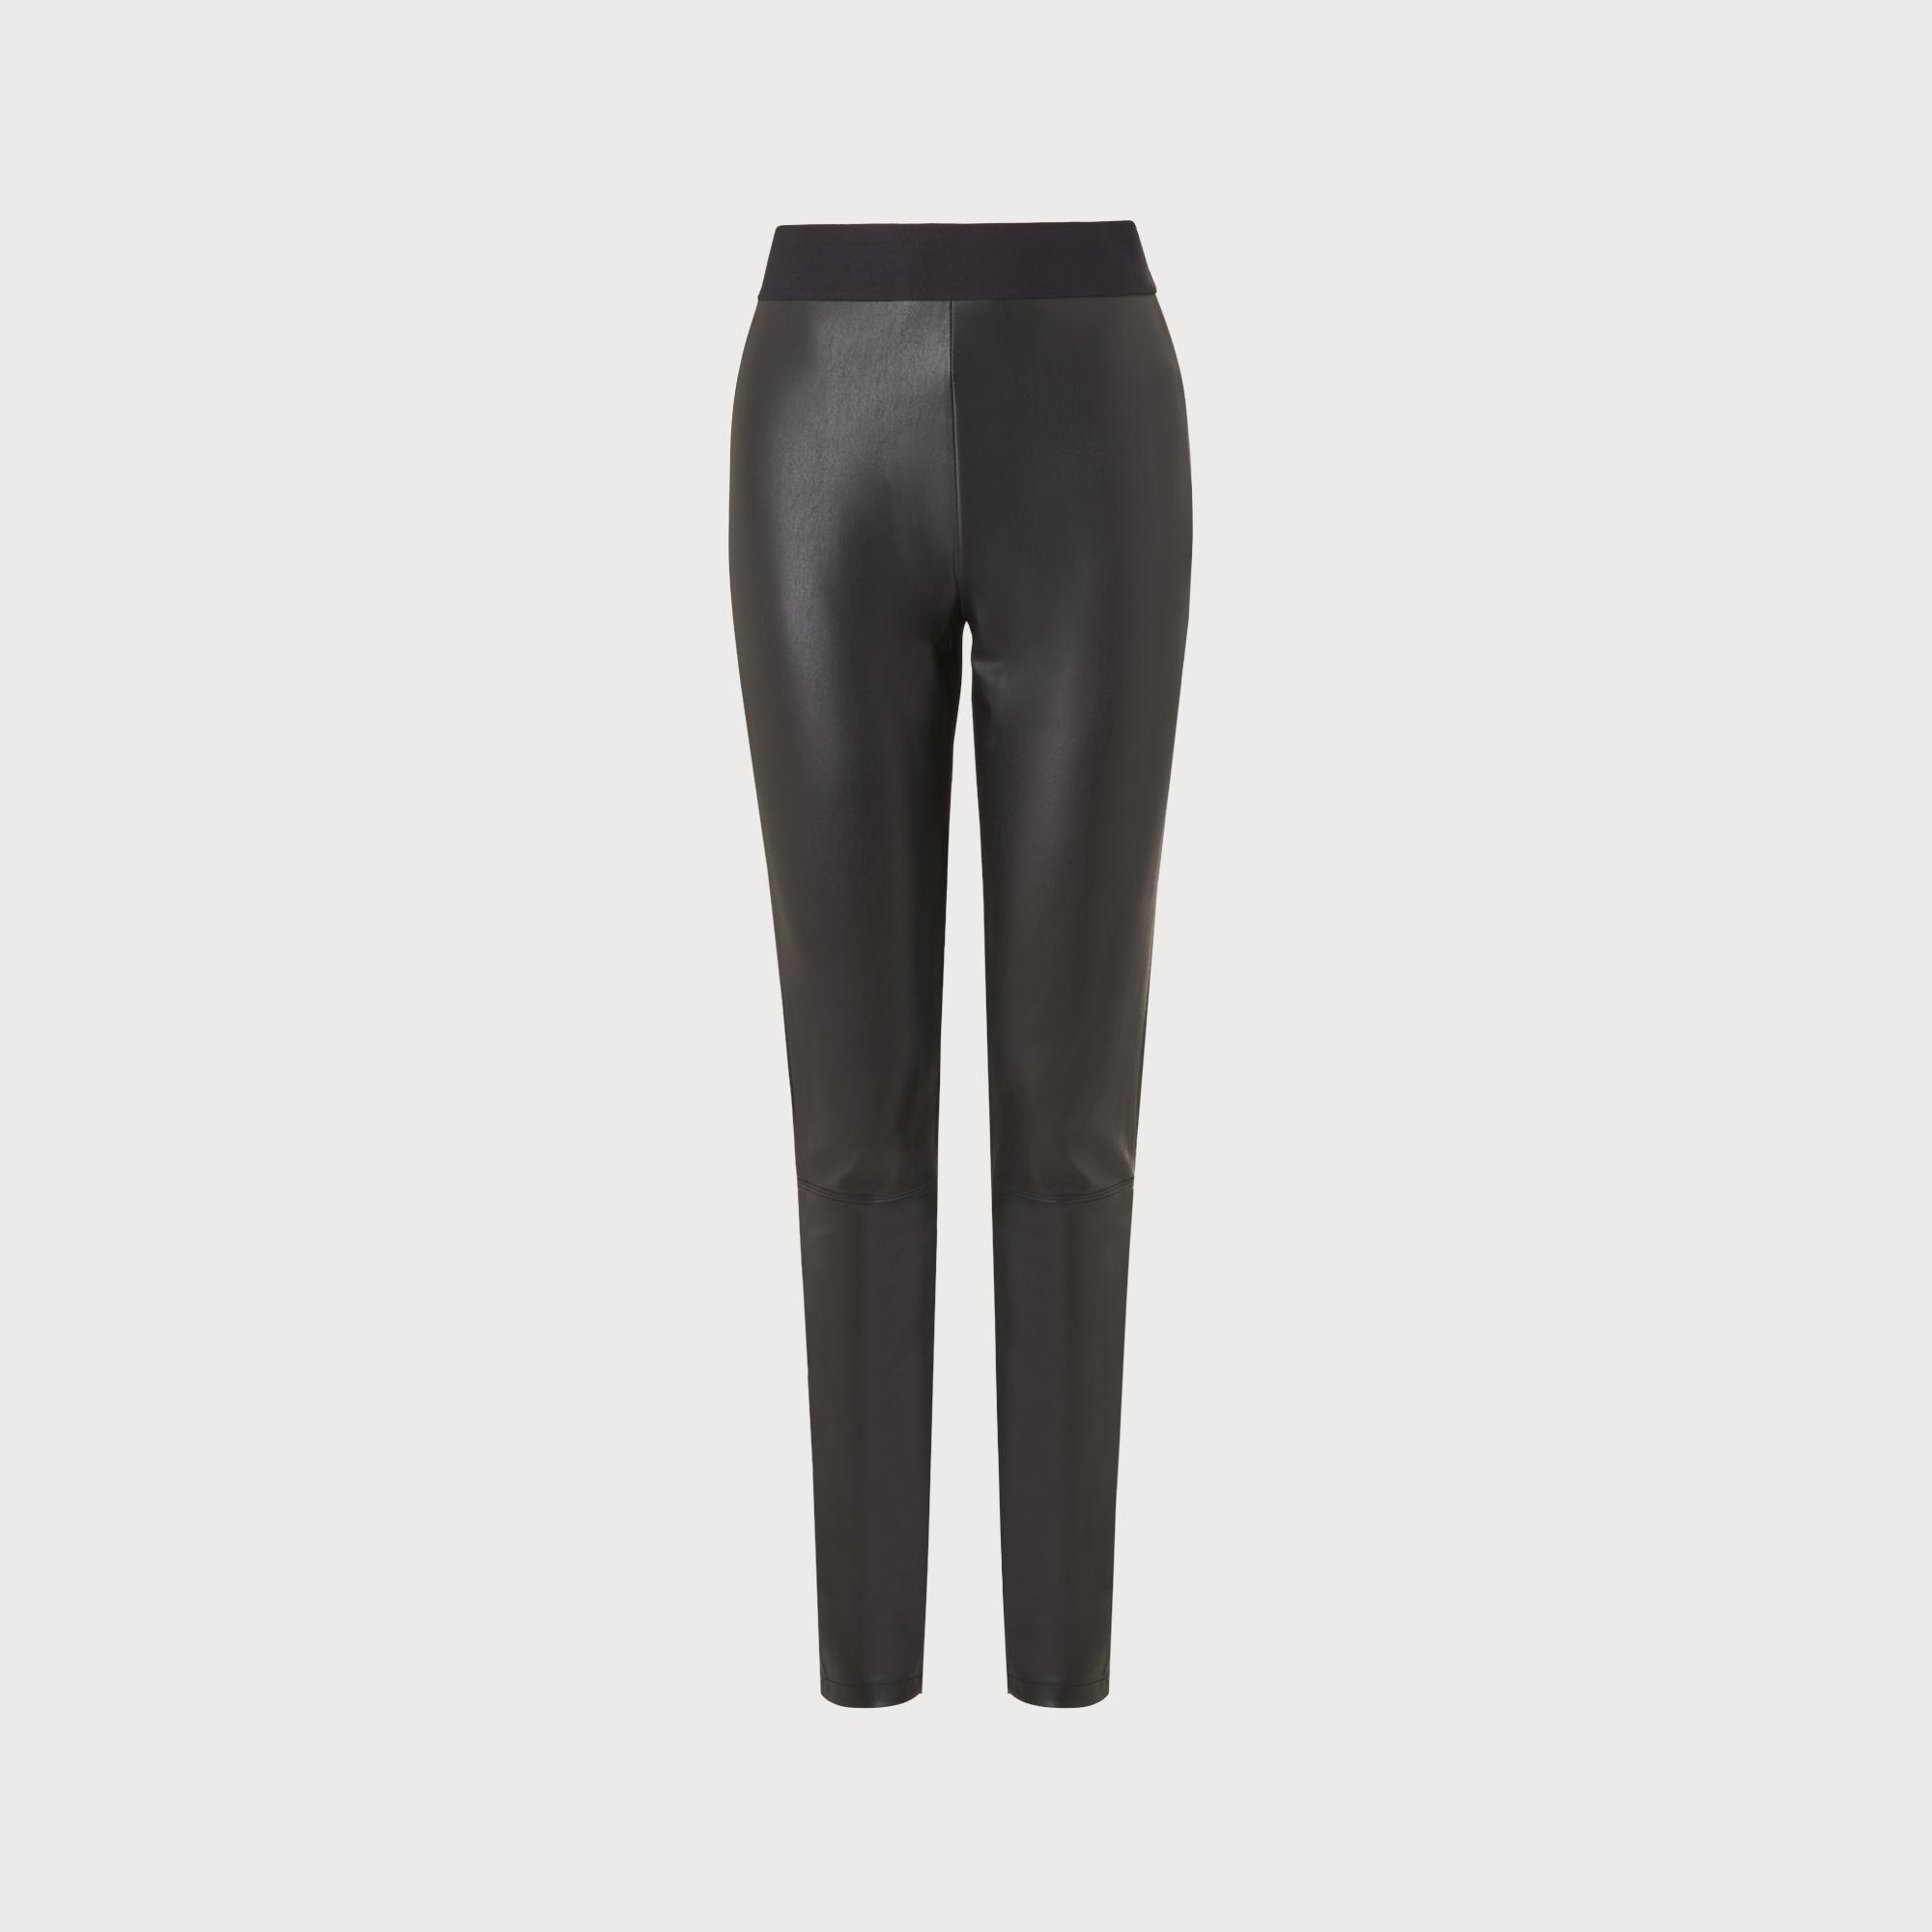 Aga Black Trouser